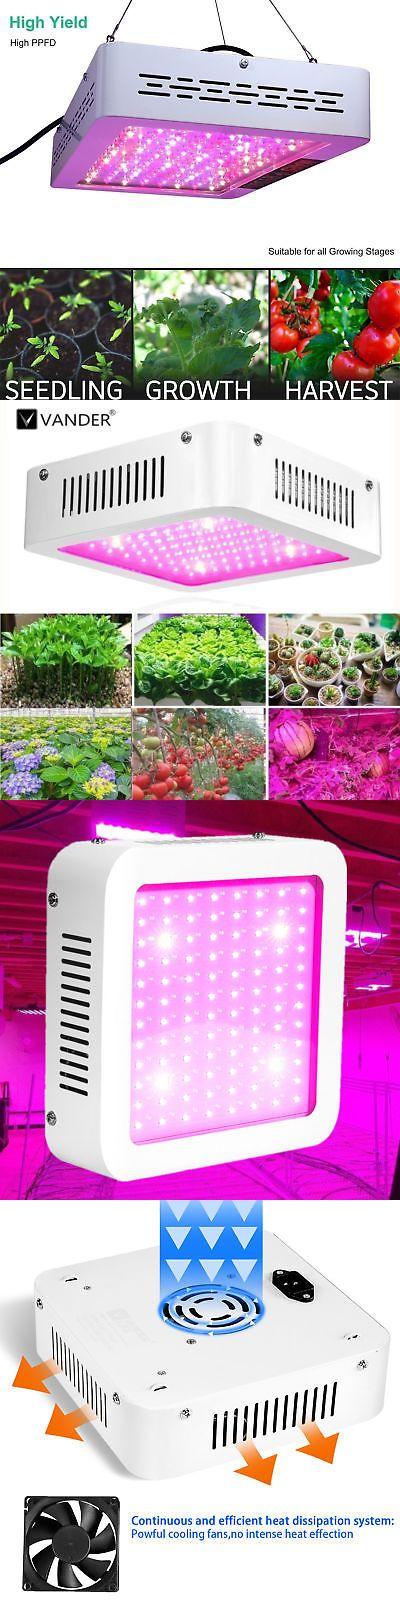 Grow Light Kits 178989 Hydroponic 1000w Led Grow Light Profession Full Spectrum Led Panel Plant Lamp Buy It Now Only Led Grow Lights Grow Lights Led Panel